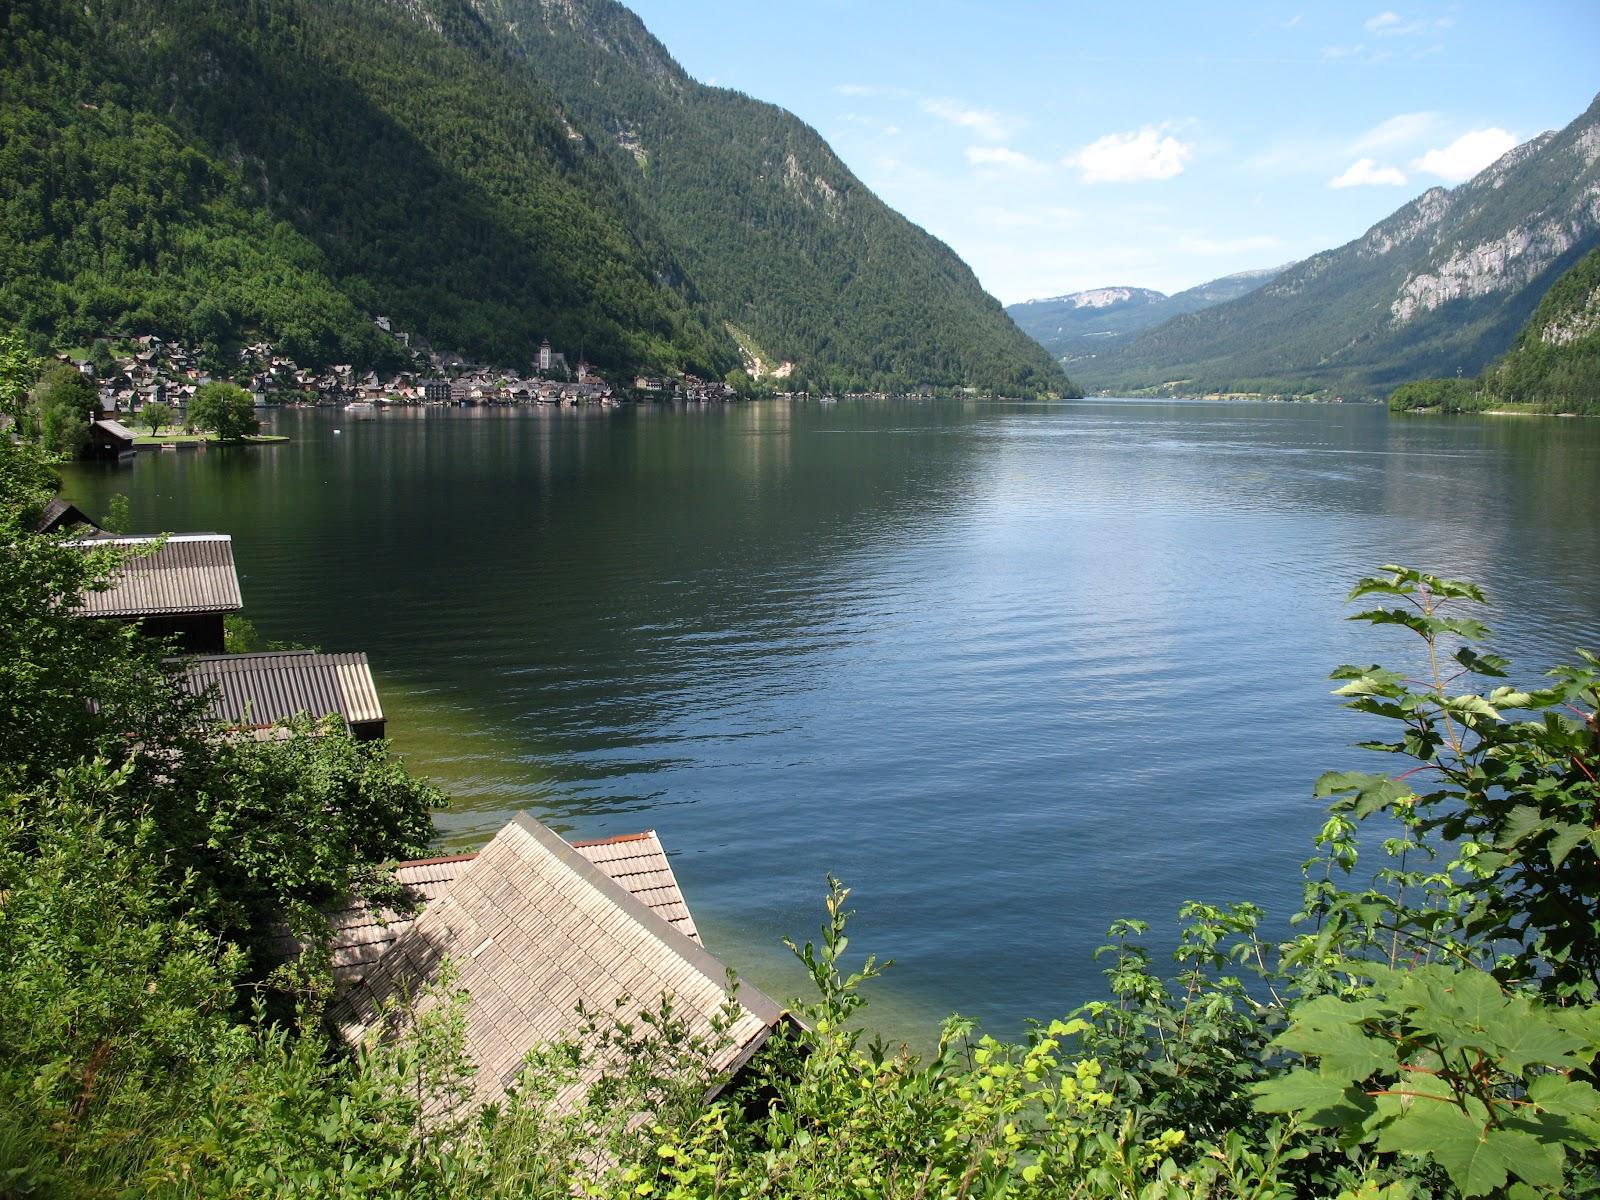 File:1053 - Hallstätter See.